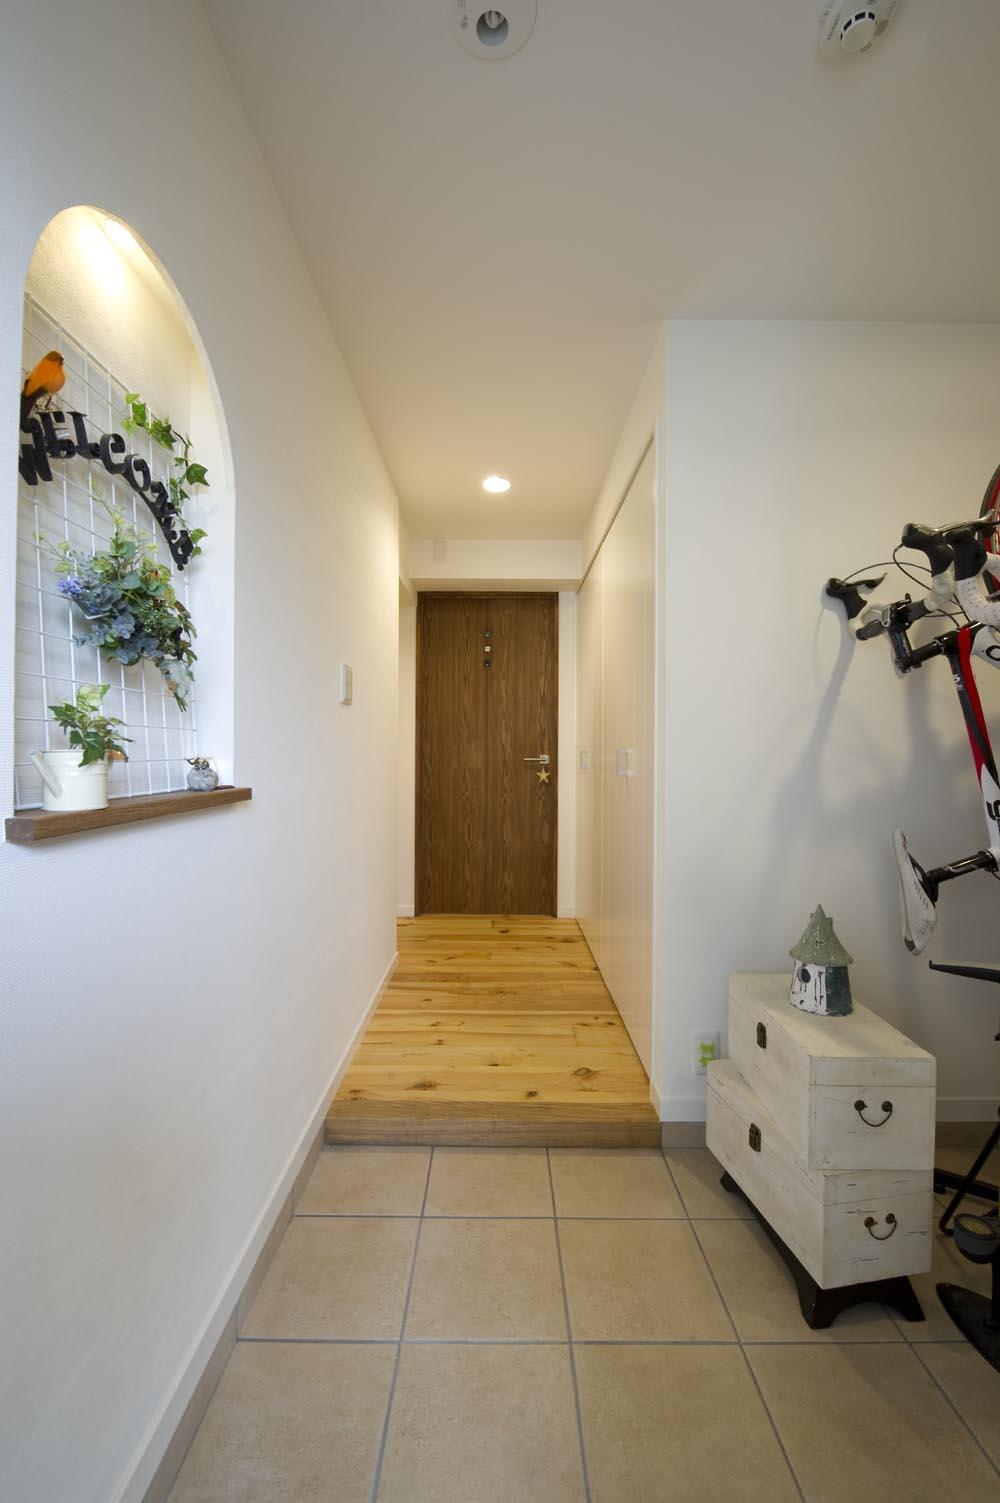 I邸・斜めに配置したキッチンで、動きと変化を (広々とした玄関スペース)